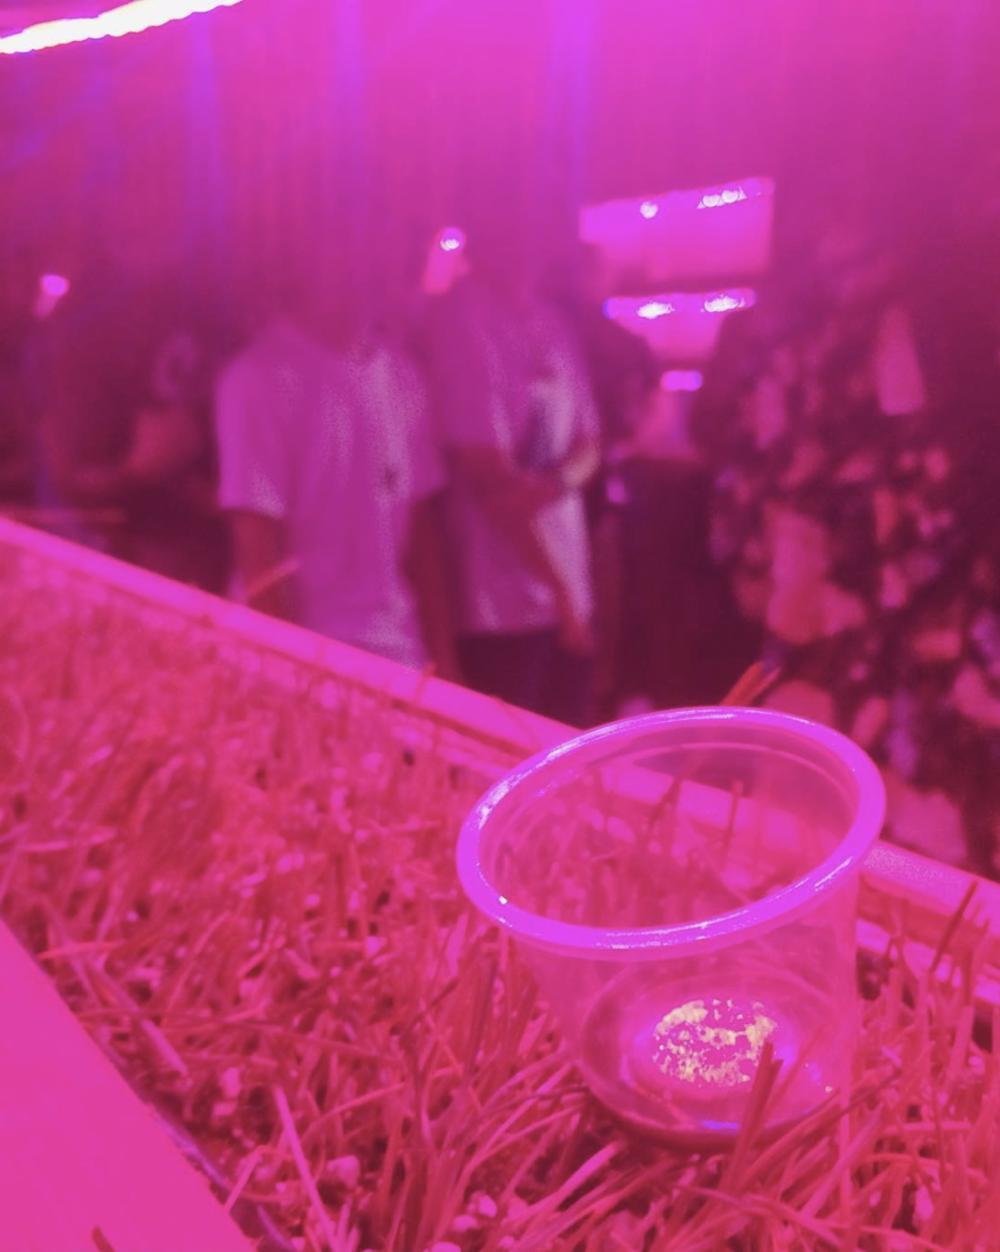 #tbt to last week when we were still moshing and juicing wheatgrass. Goodbye, #permacounterculture ! #sopunk  #wheatgrass  #hamfam  @wowsugi  #acreativedc 🌾  post by  ndowd09